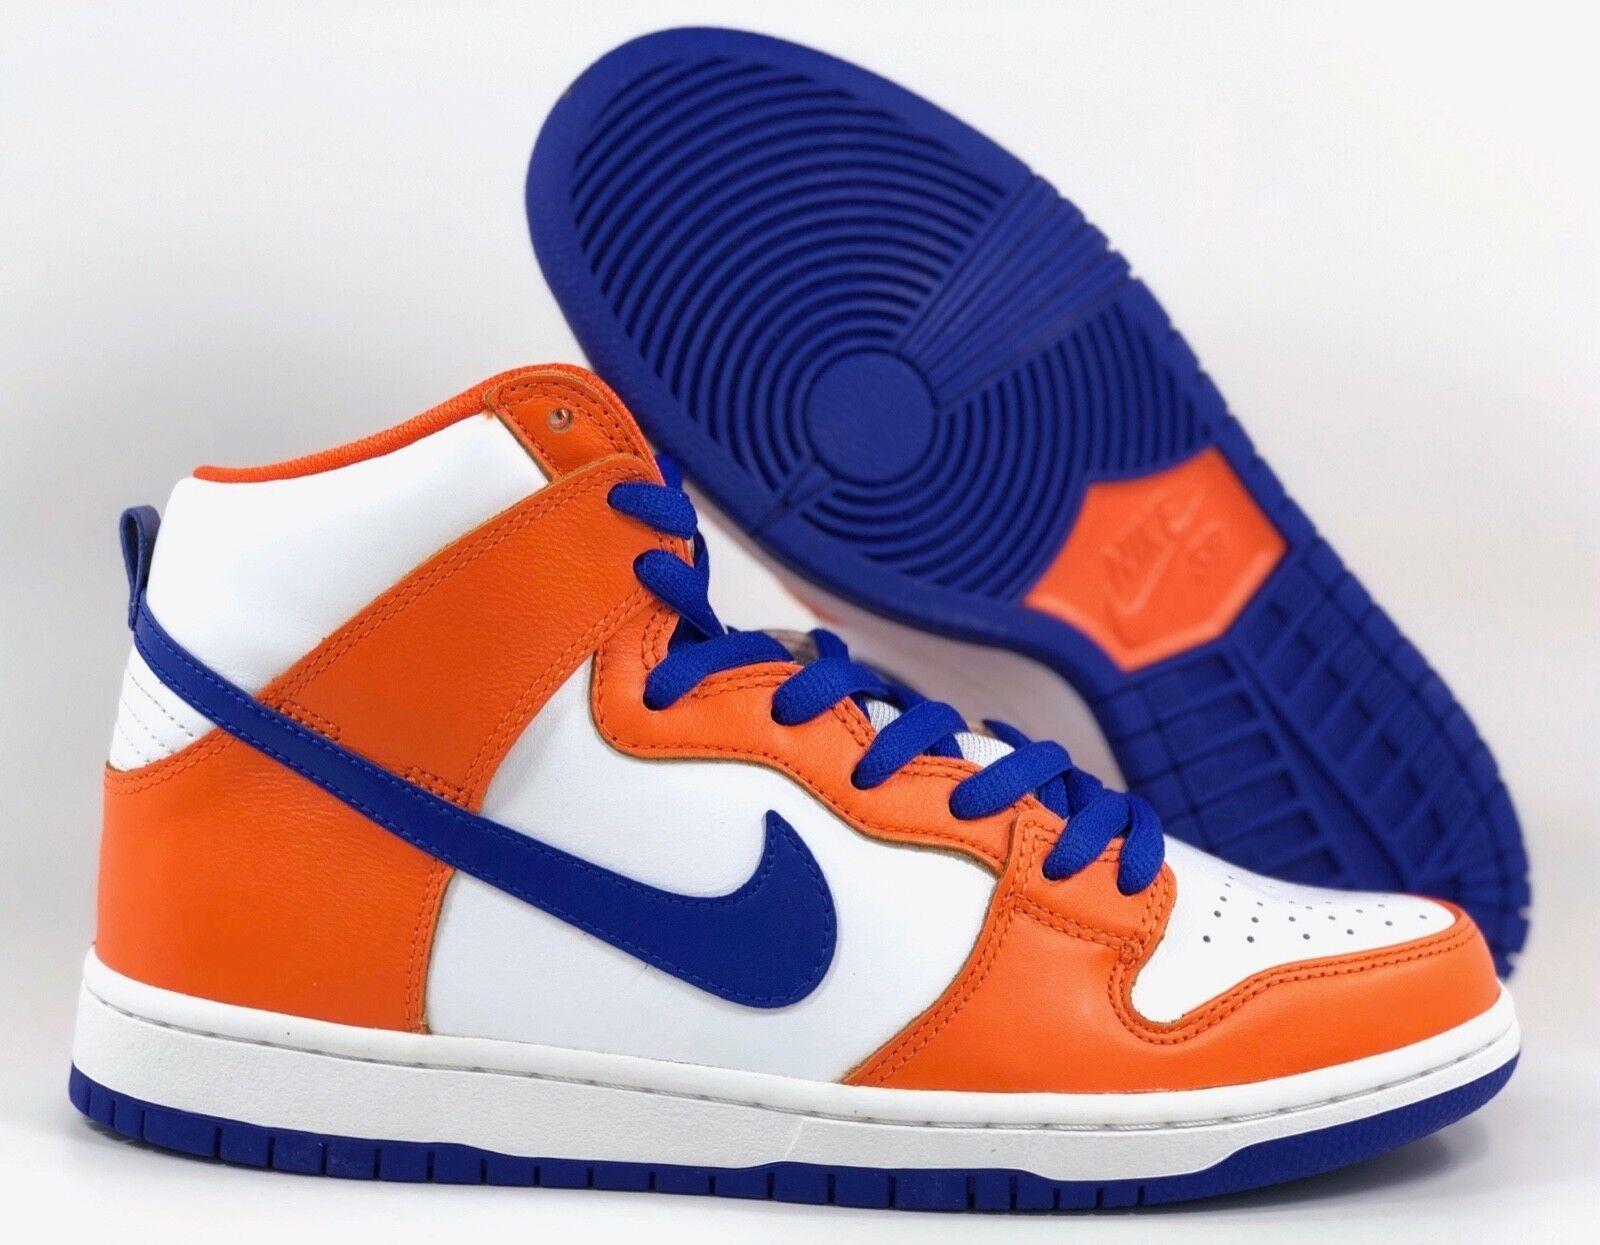 Nike SB Dunk High TRD QS Danny Supa orange blueee White AH0471-841 Men's 11